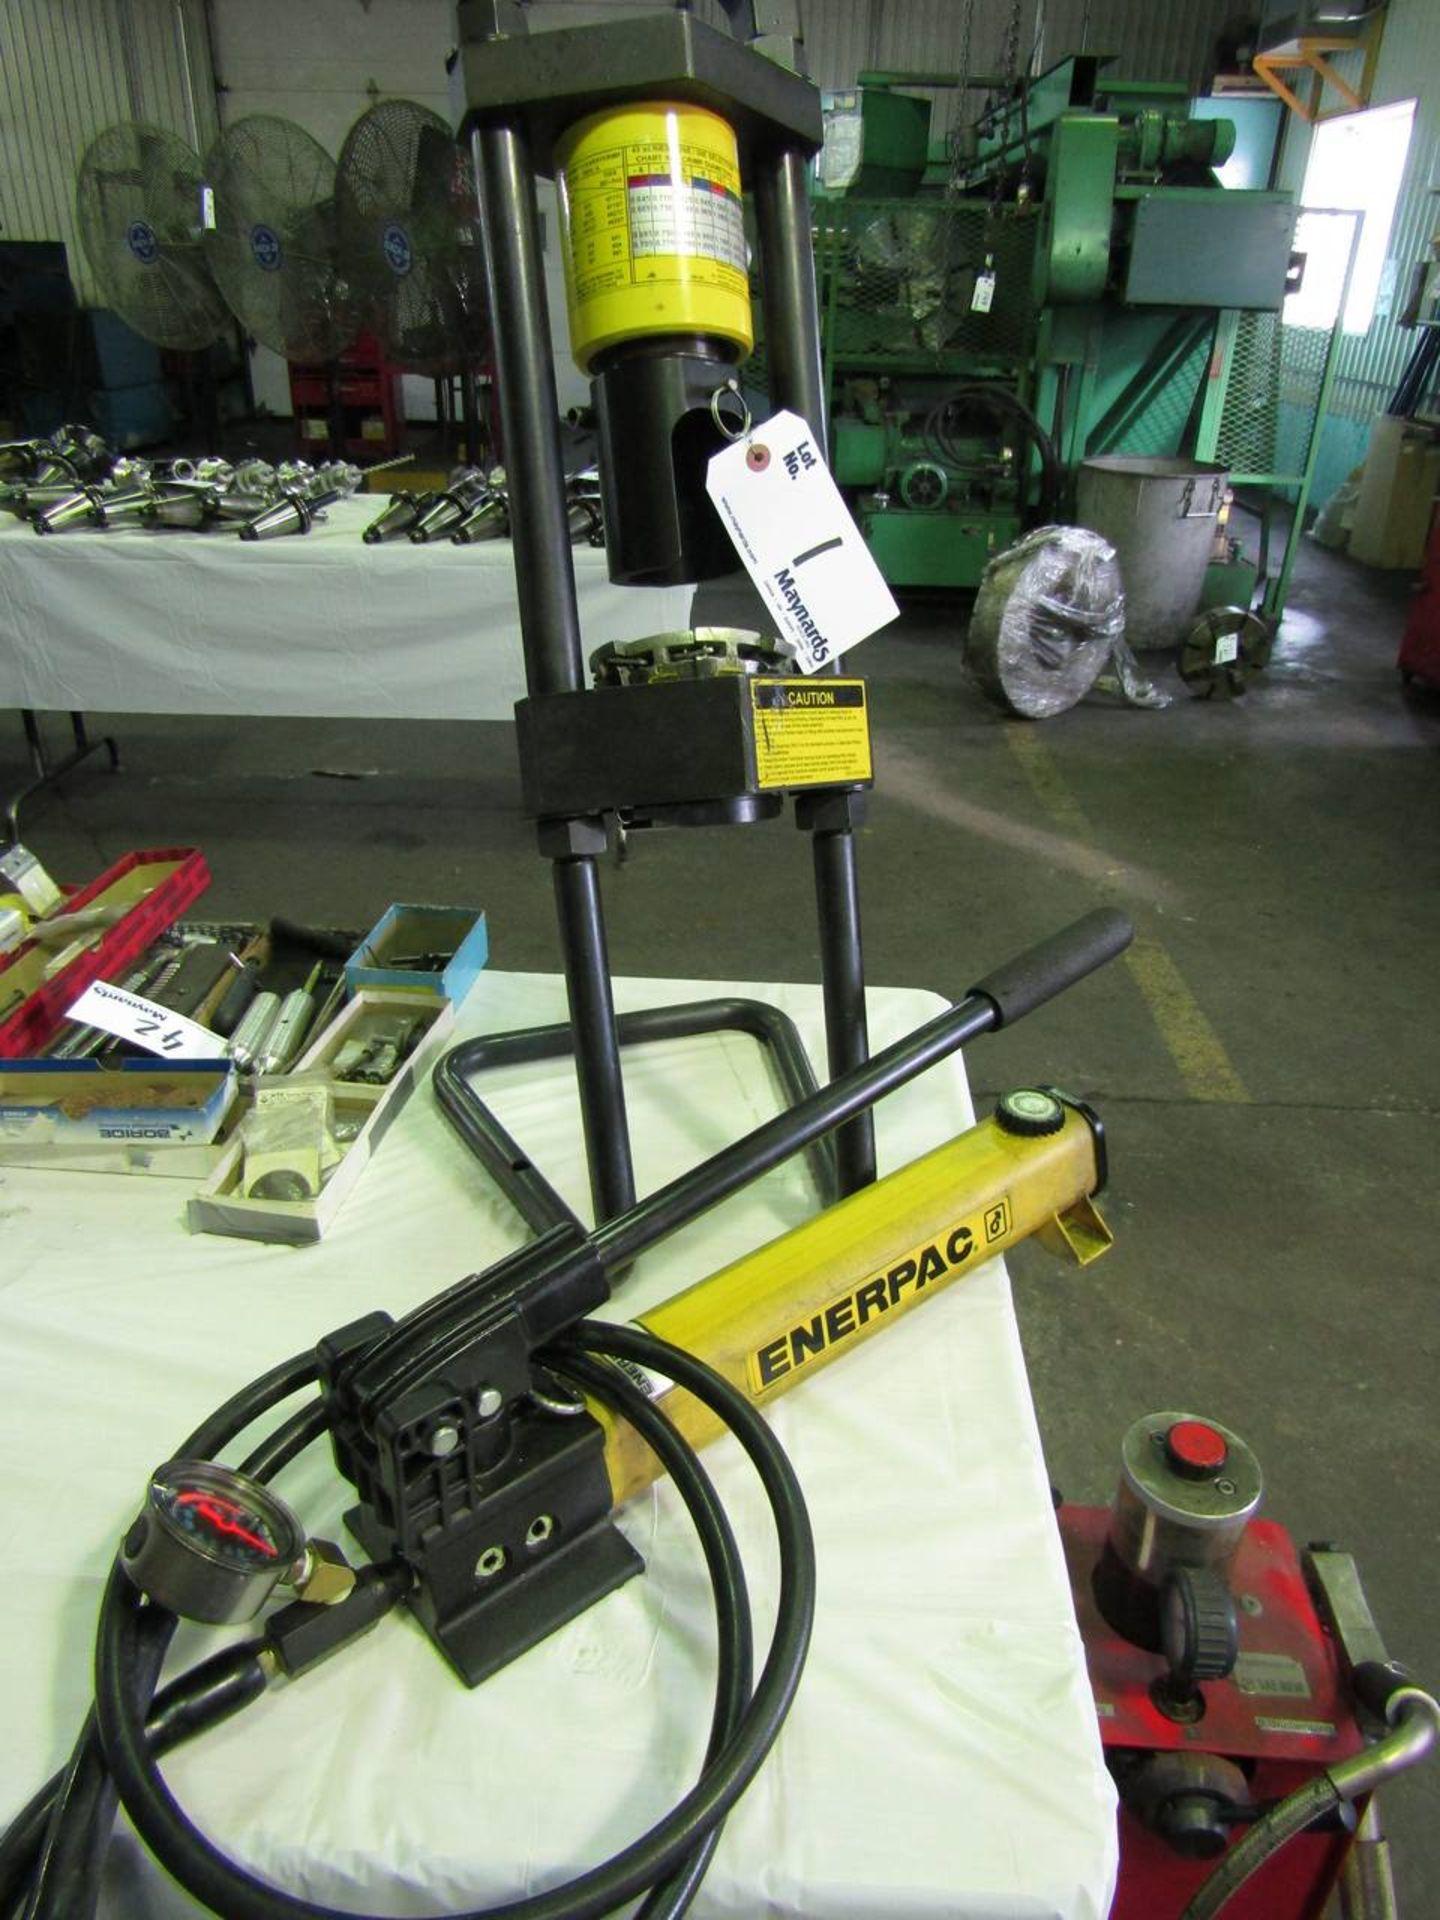 Enerpac/KerryKrimp P392/82C-080 Hydrualic hand pump